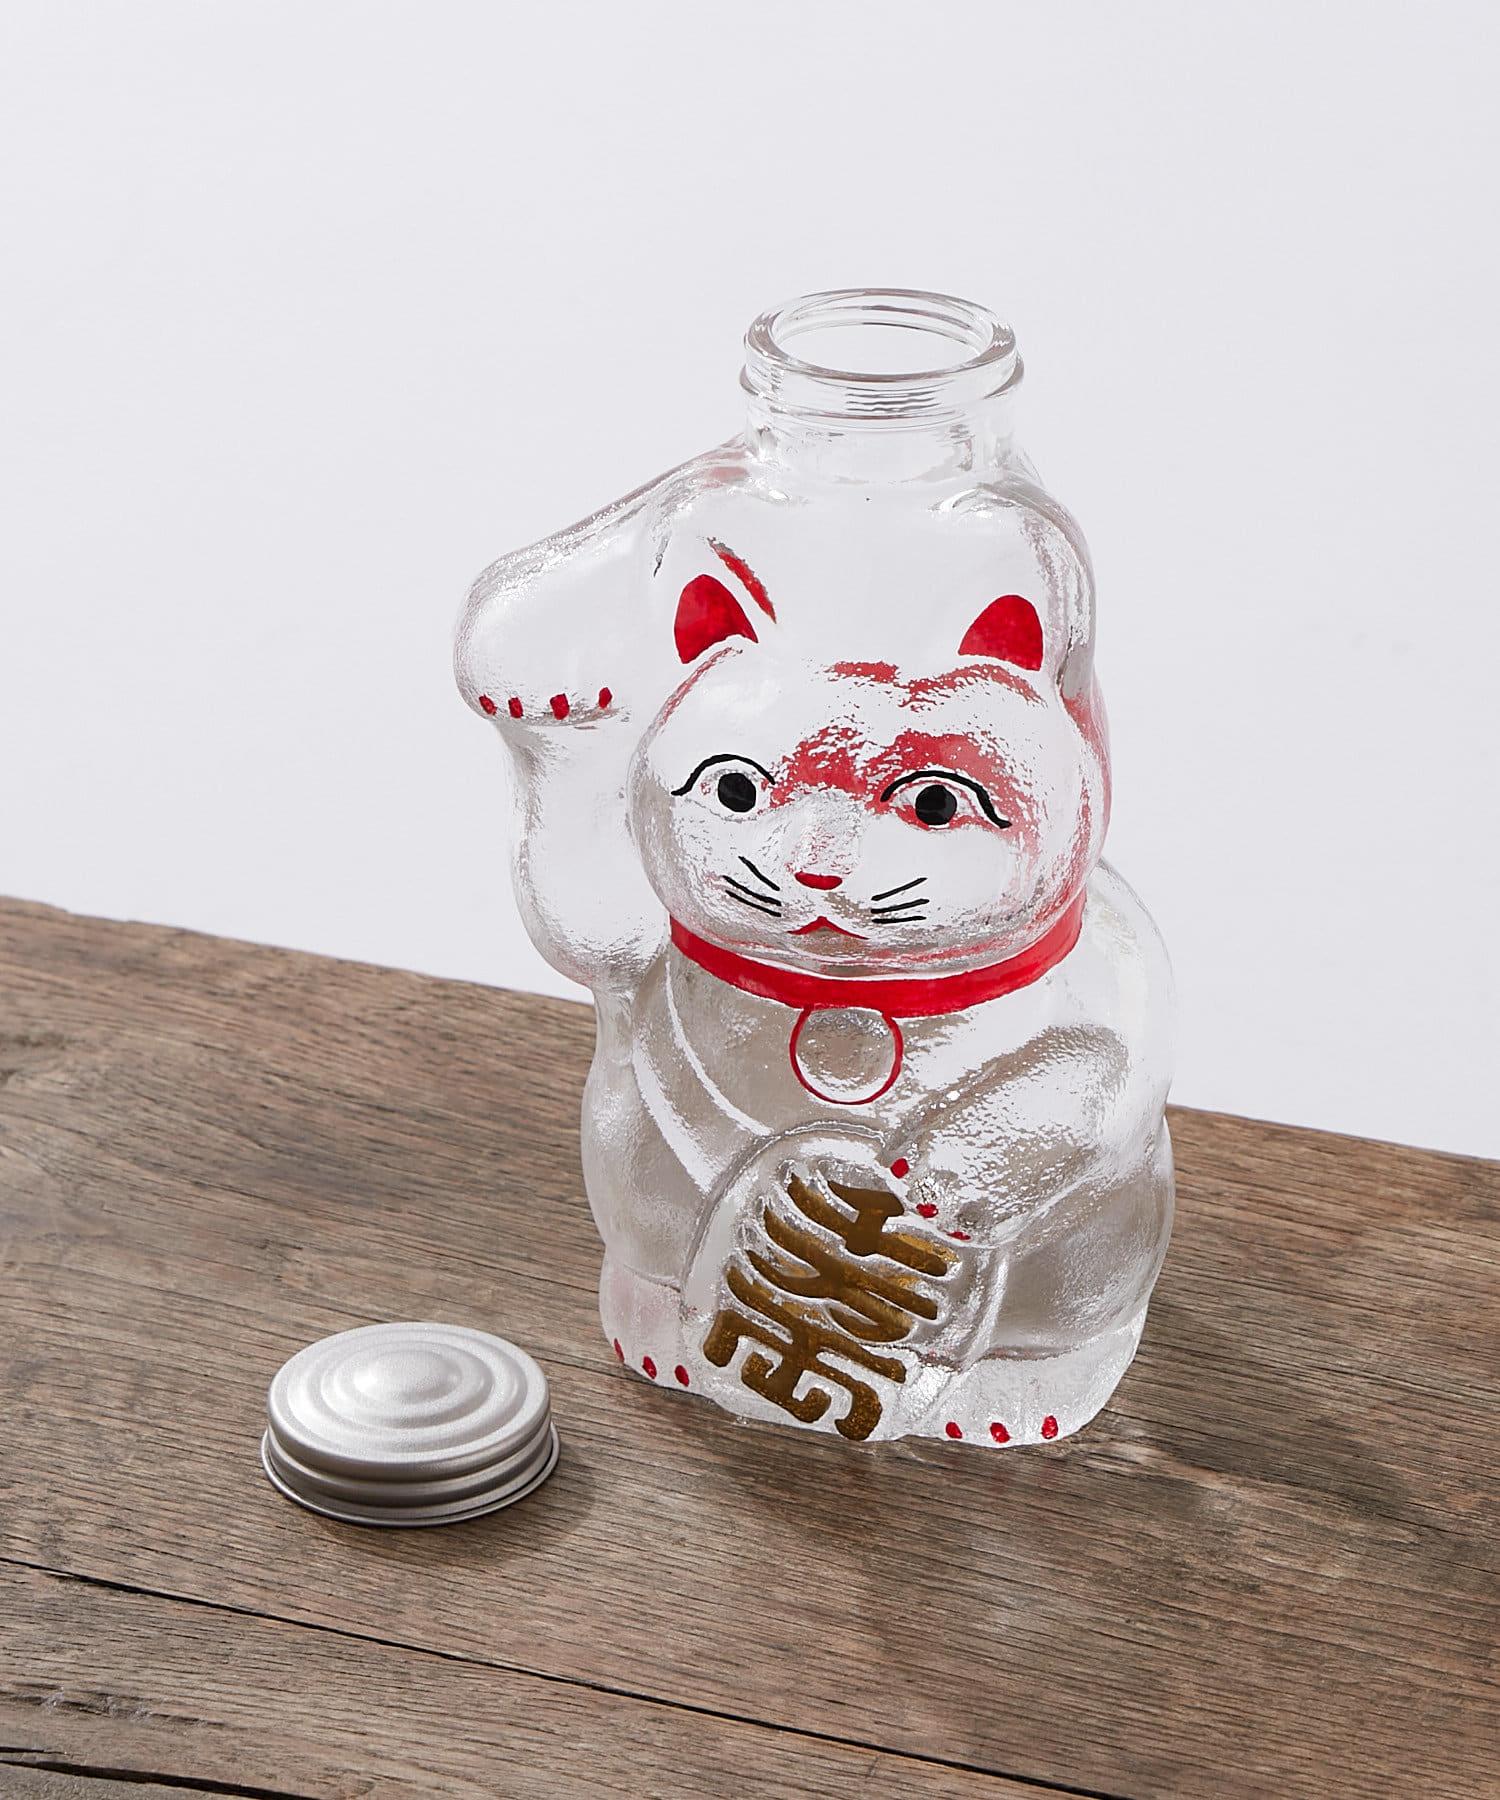 BONbazaar(ボンバザール) 【廣田硝子】招き猫 菓子瓶小